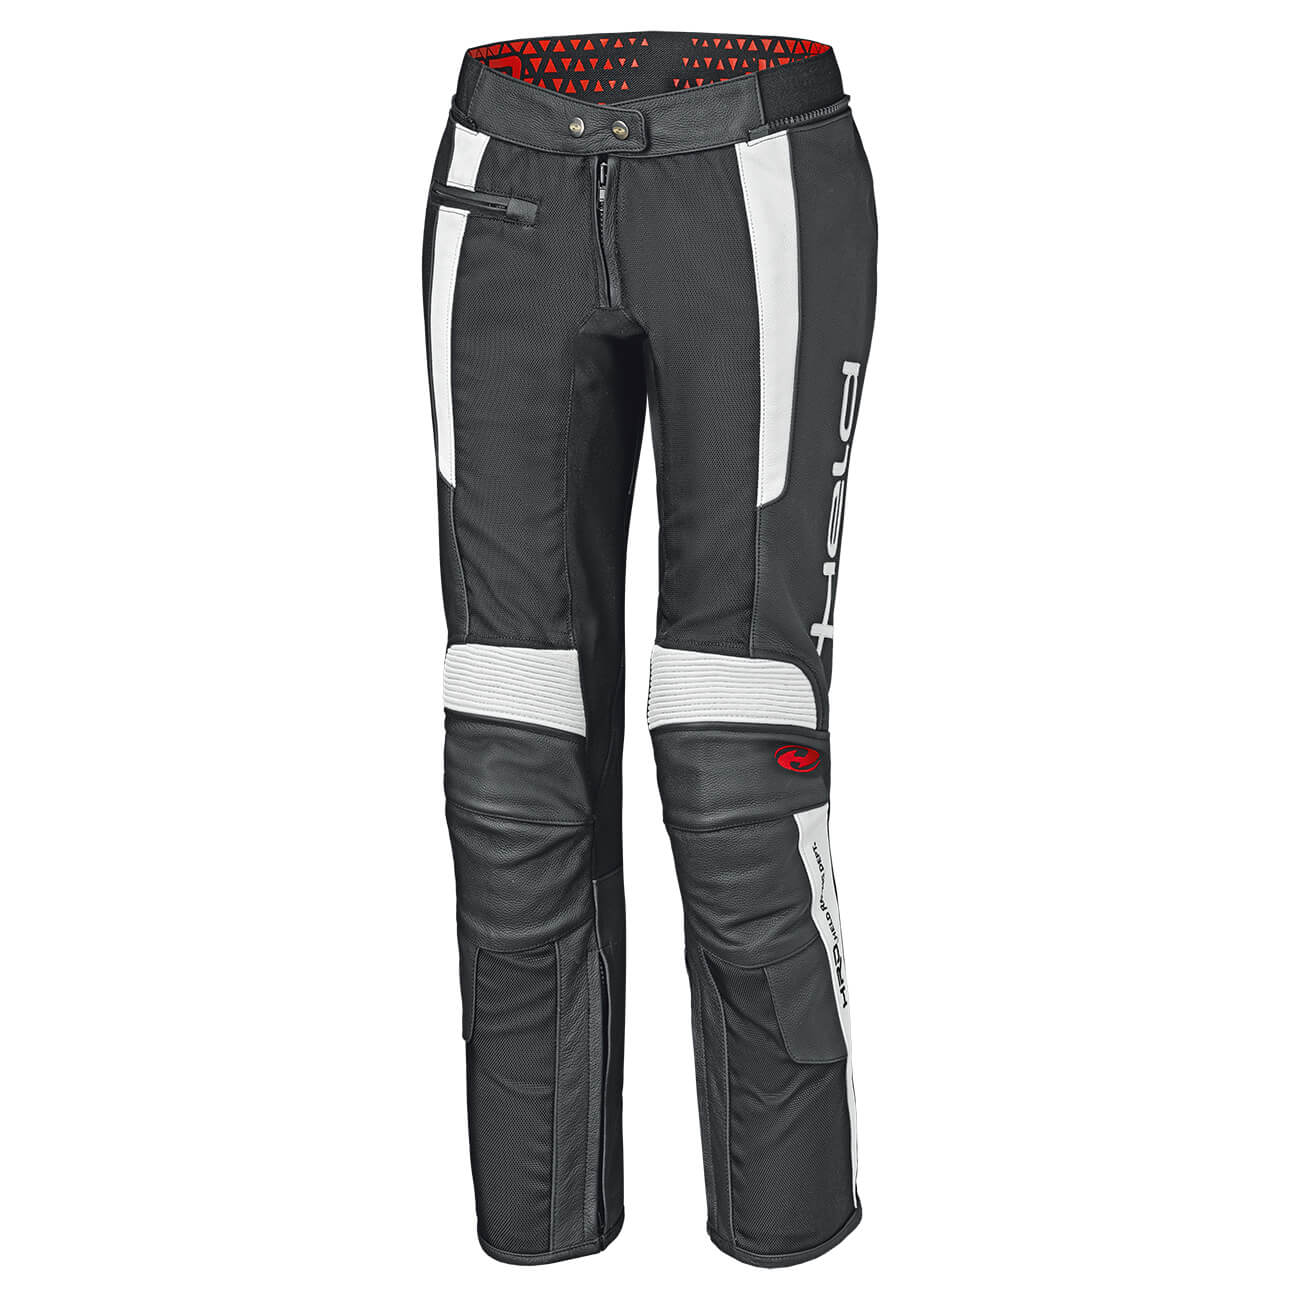 1771d7f48 dámske športové nohavice Takano II | Held Biker Fashion - všetko pre ...